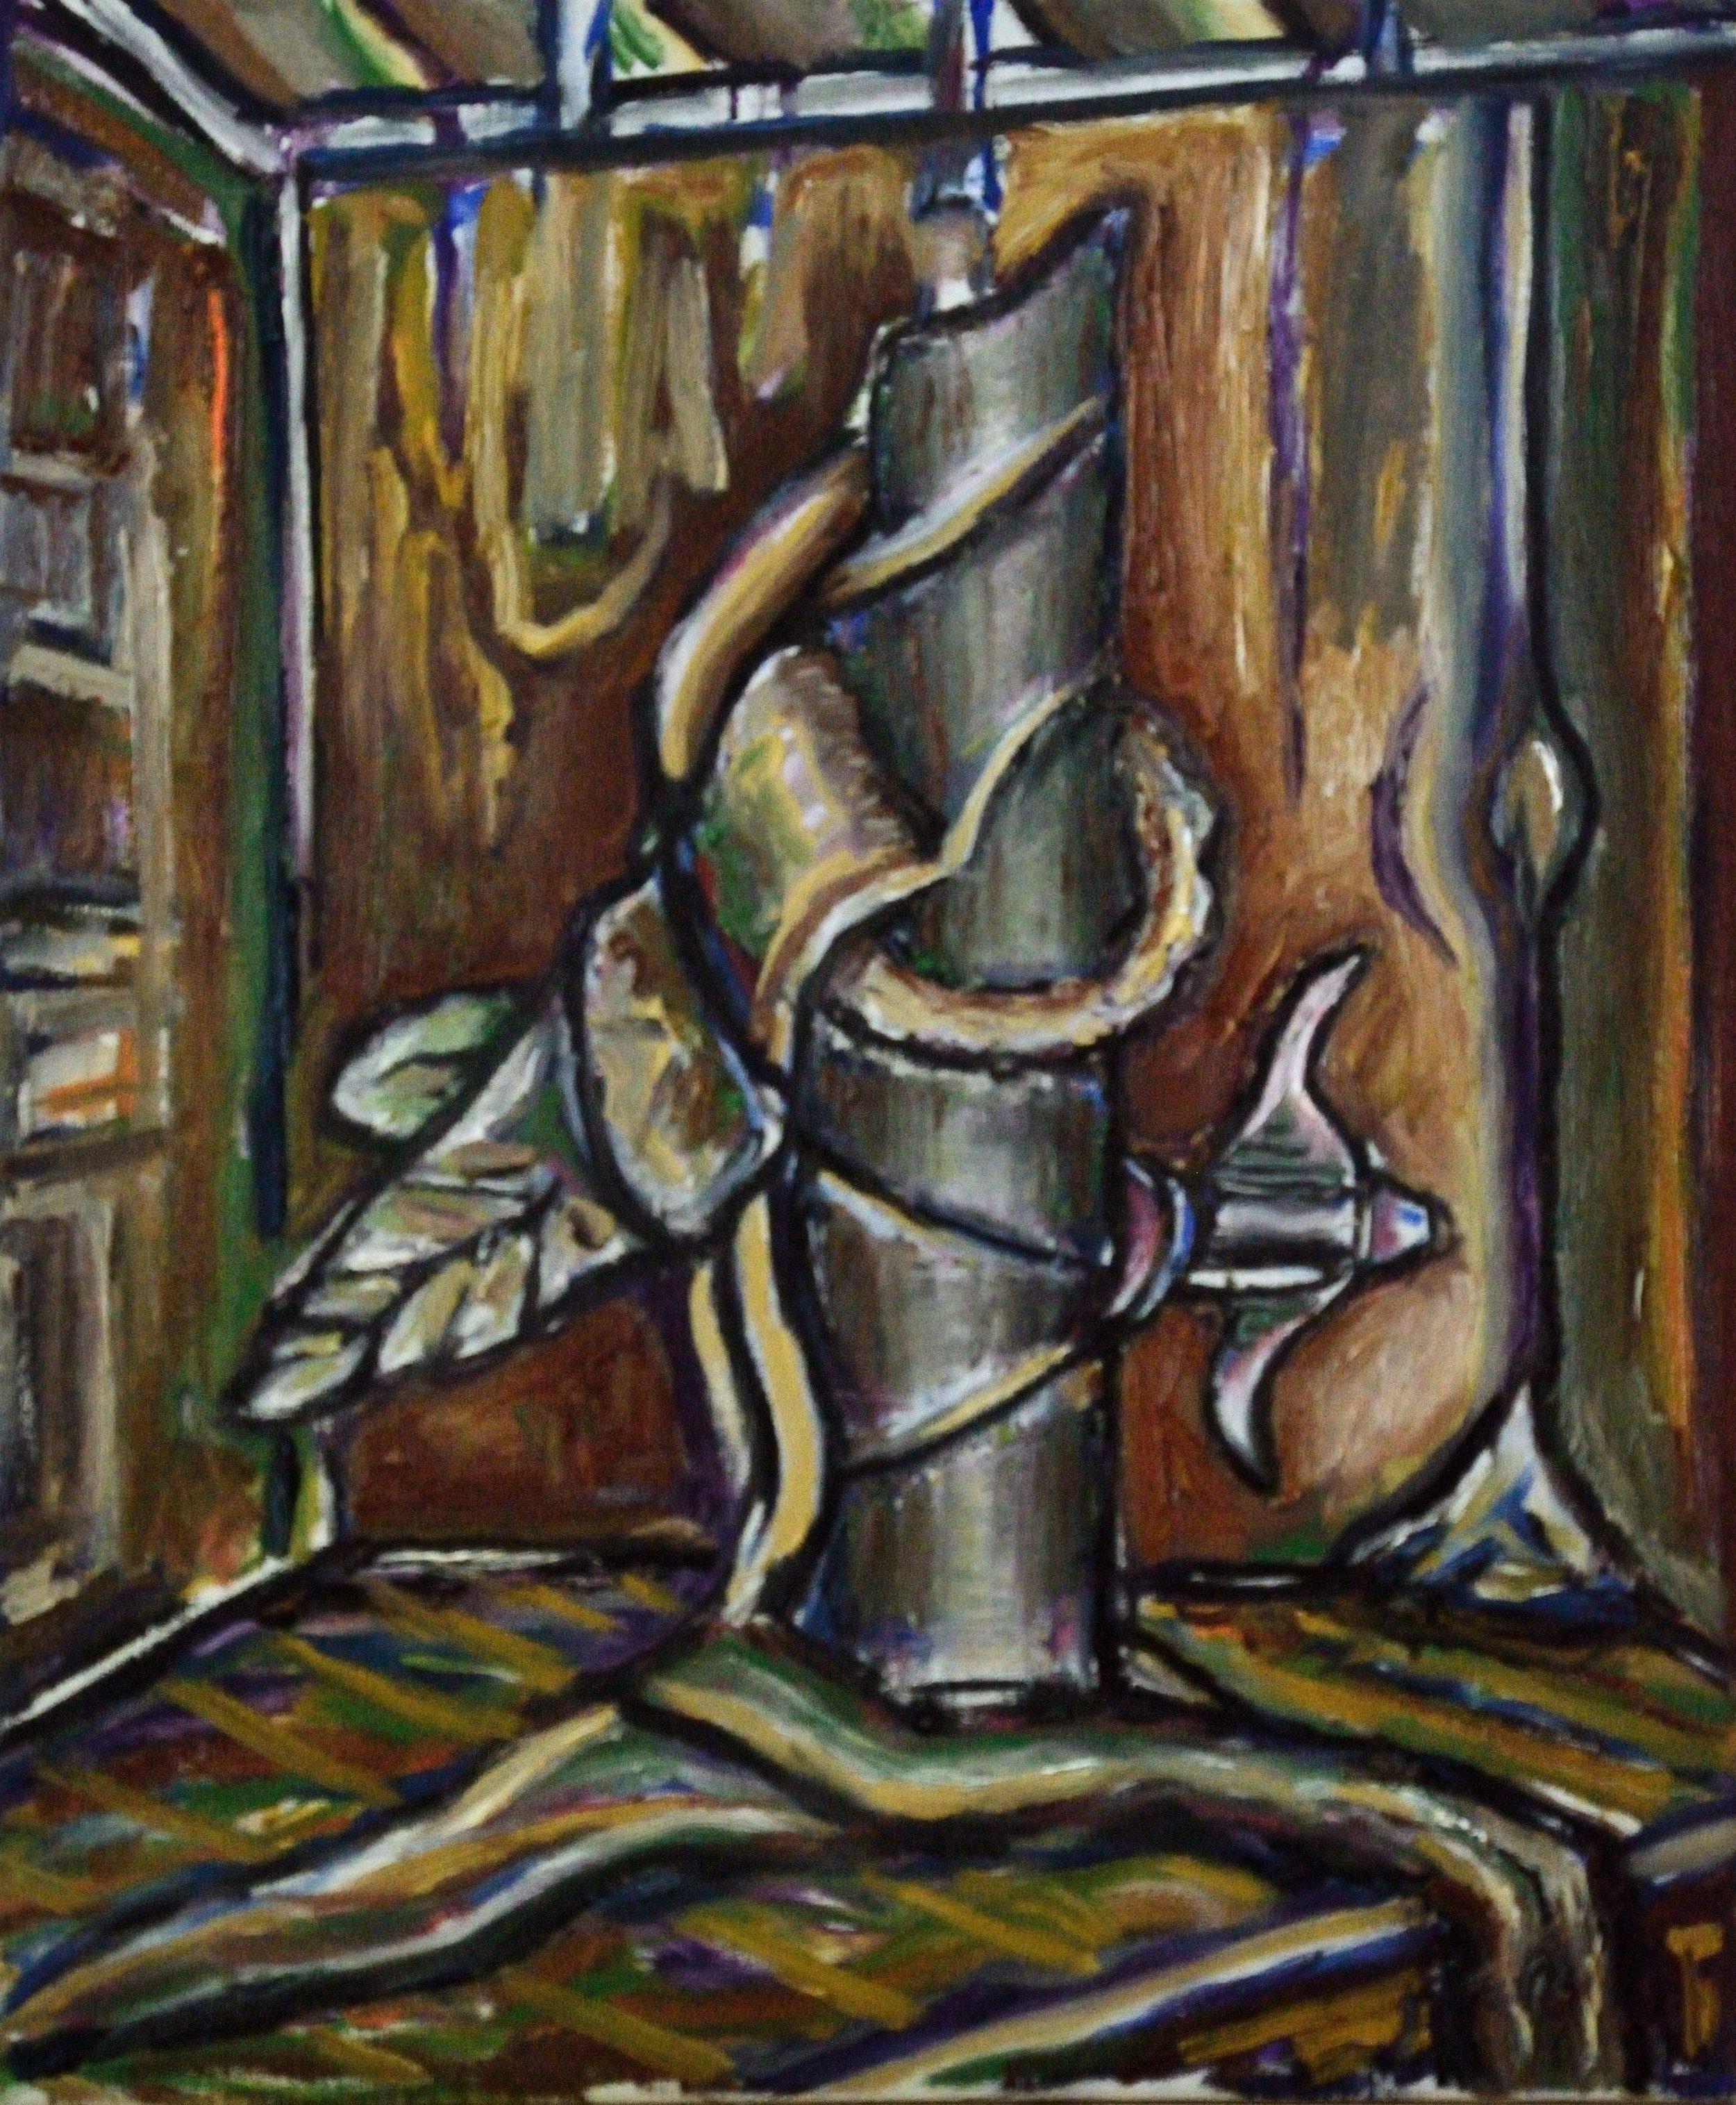 MDPCC, 60x50cm, oil on canvas